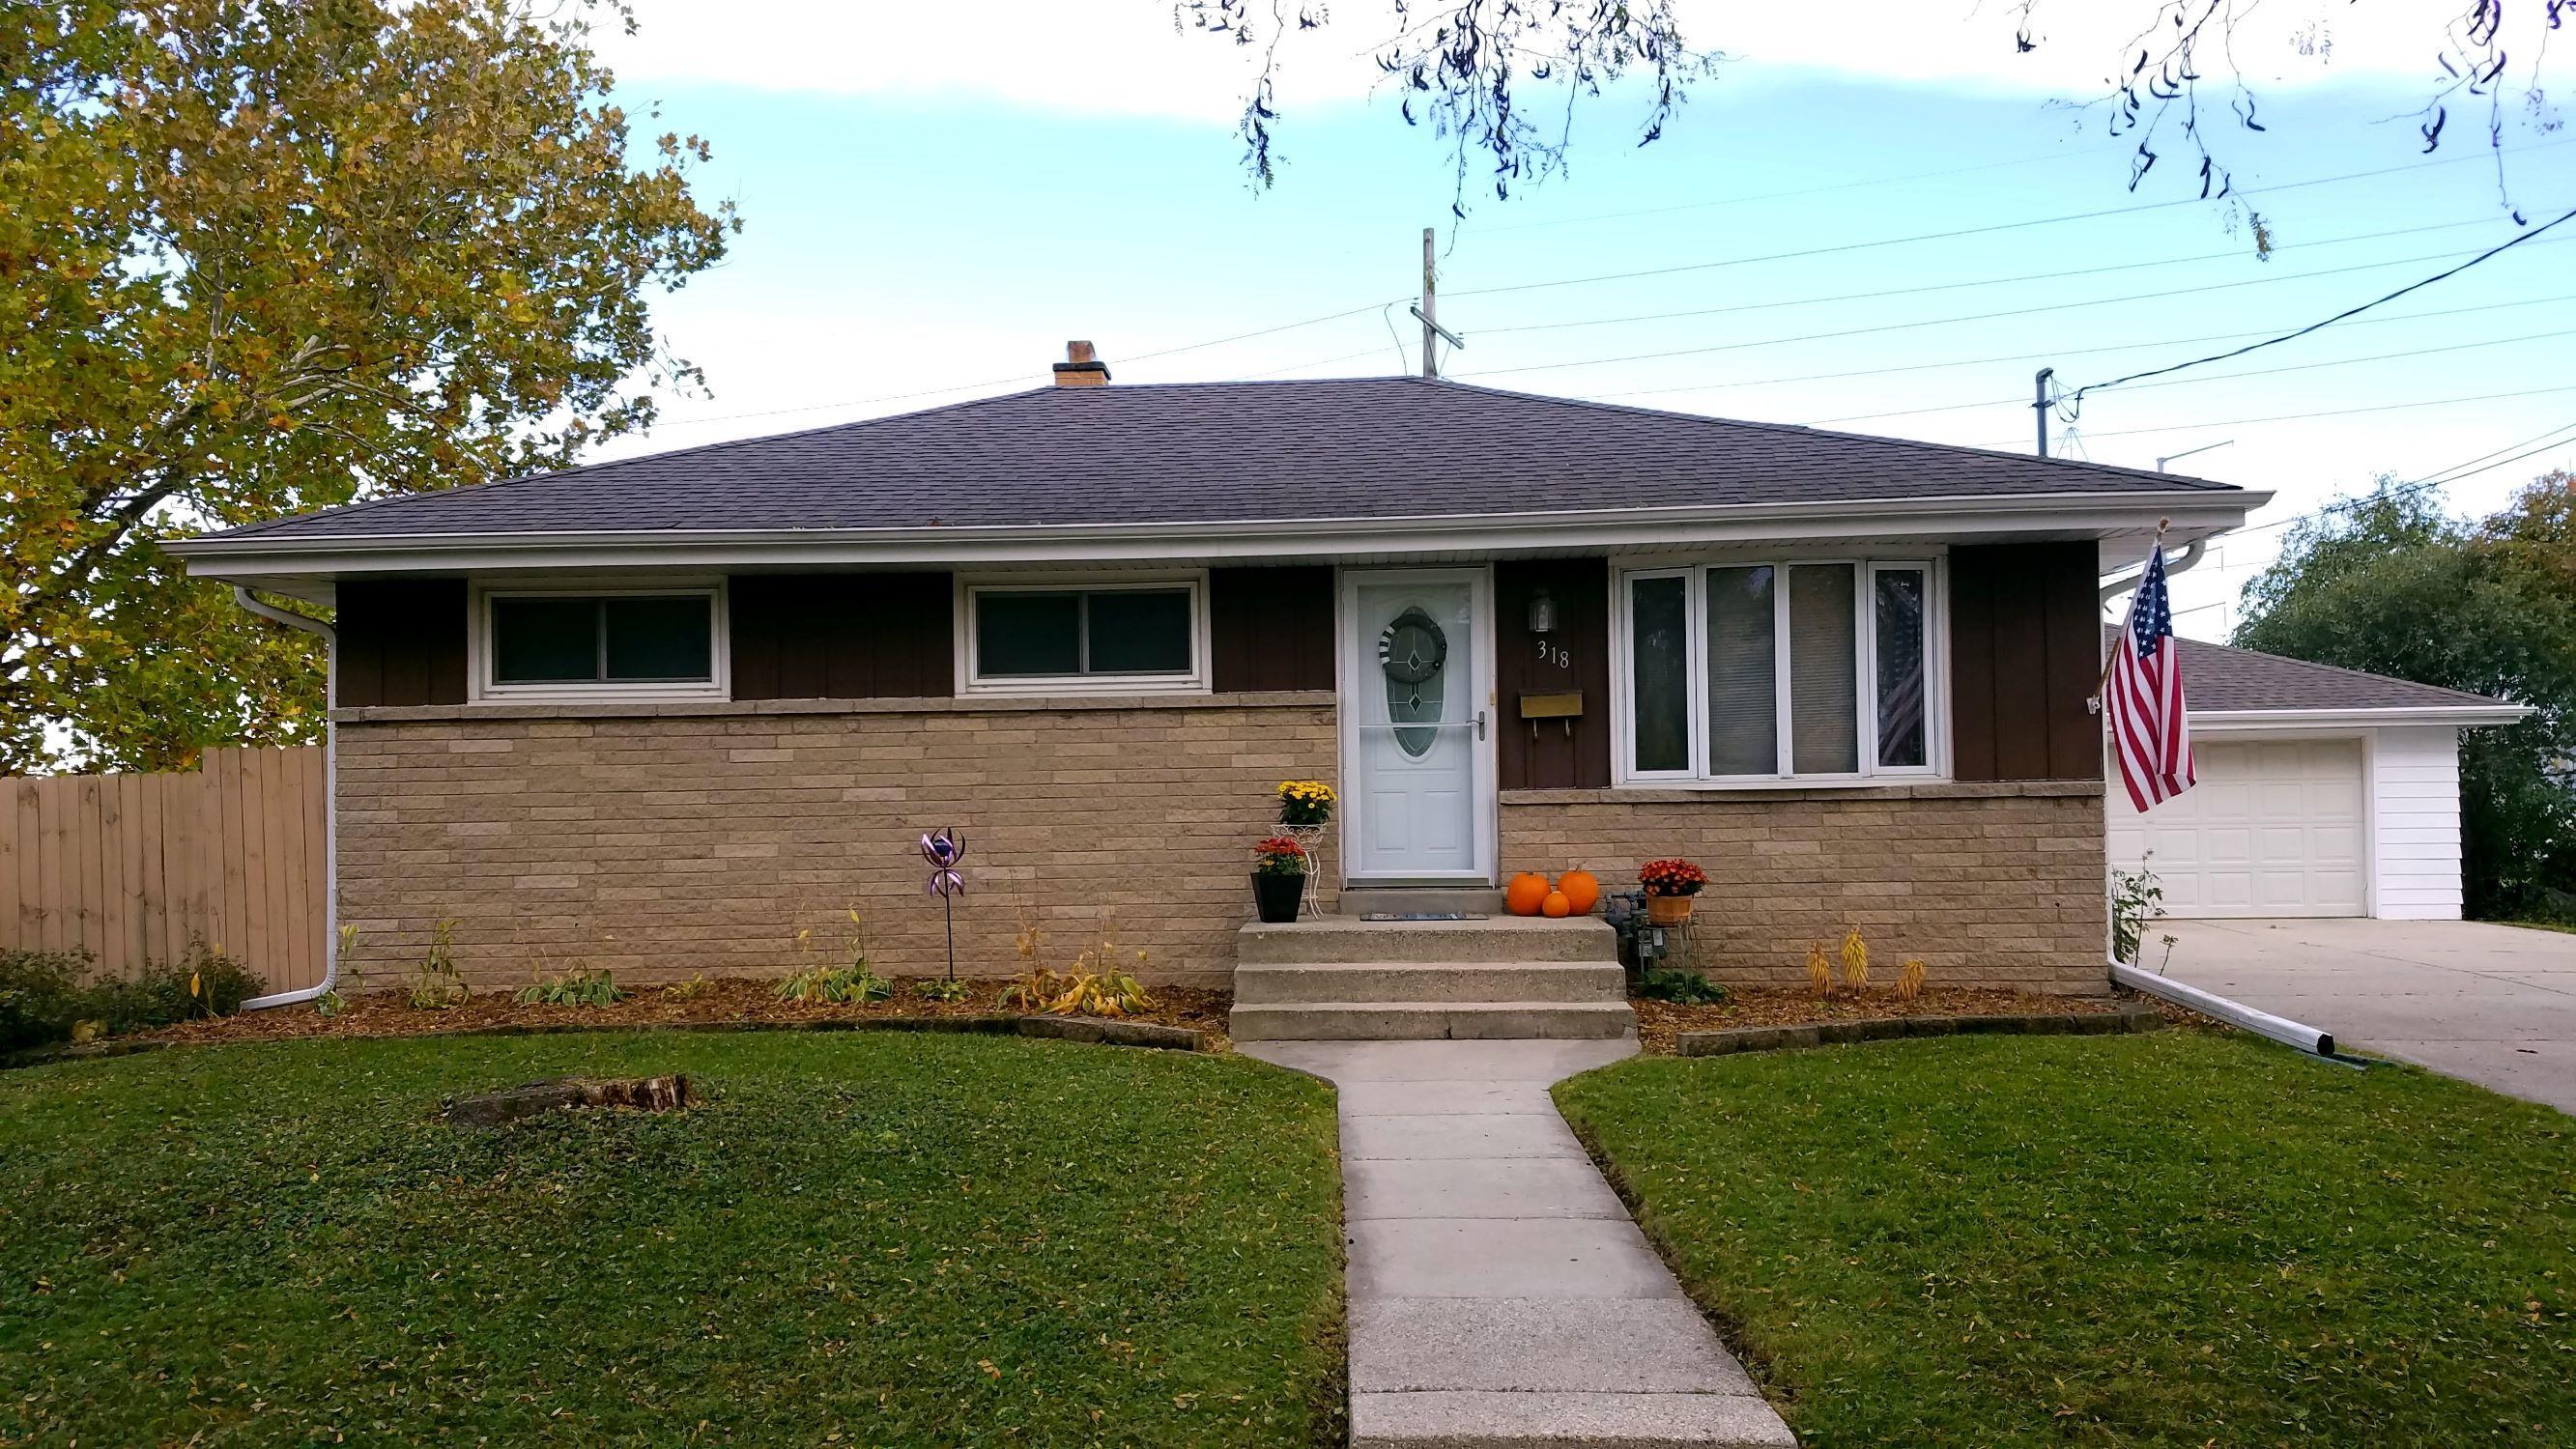 318 Gascoigne Dr, Waukesha, Wisconsin 53188, 3 Bedrooms Bedrooms, 6 Rooms Rooms,1 BathroomBathrooms,Single-Family,For Sale,Gascoigne Dr,1666723